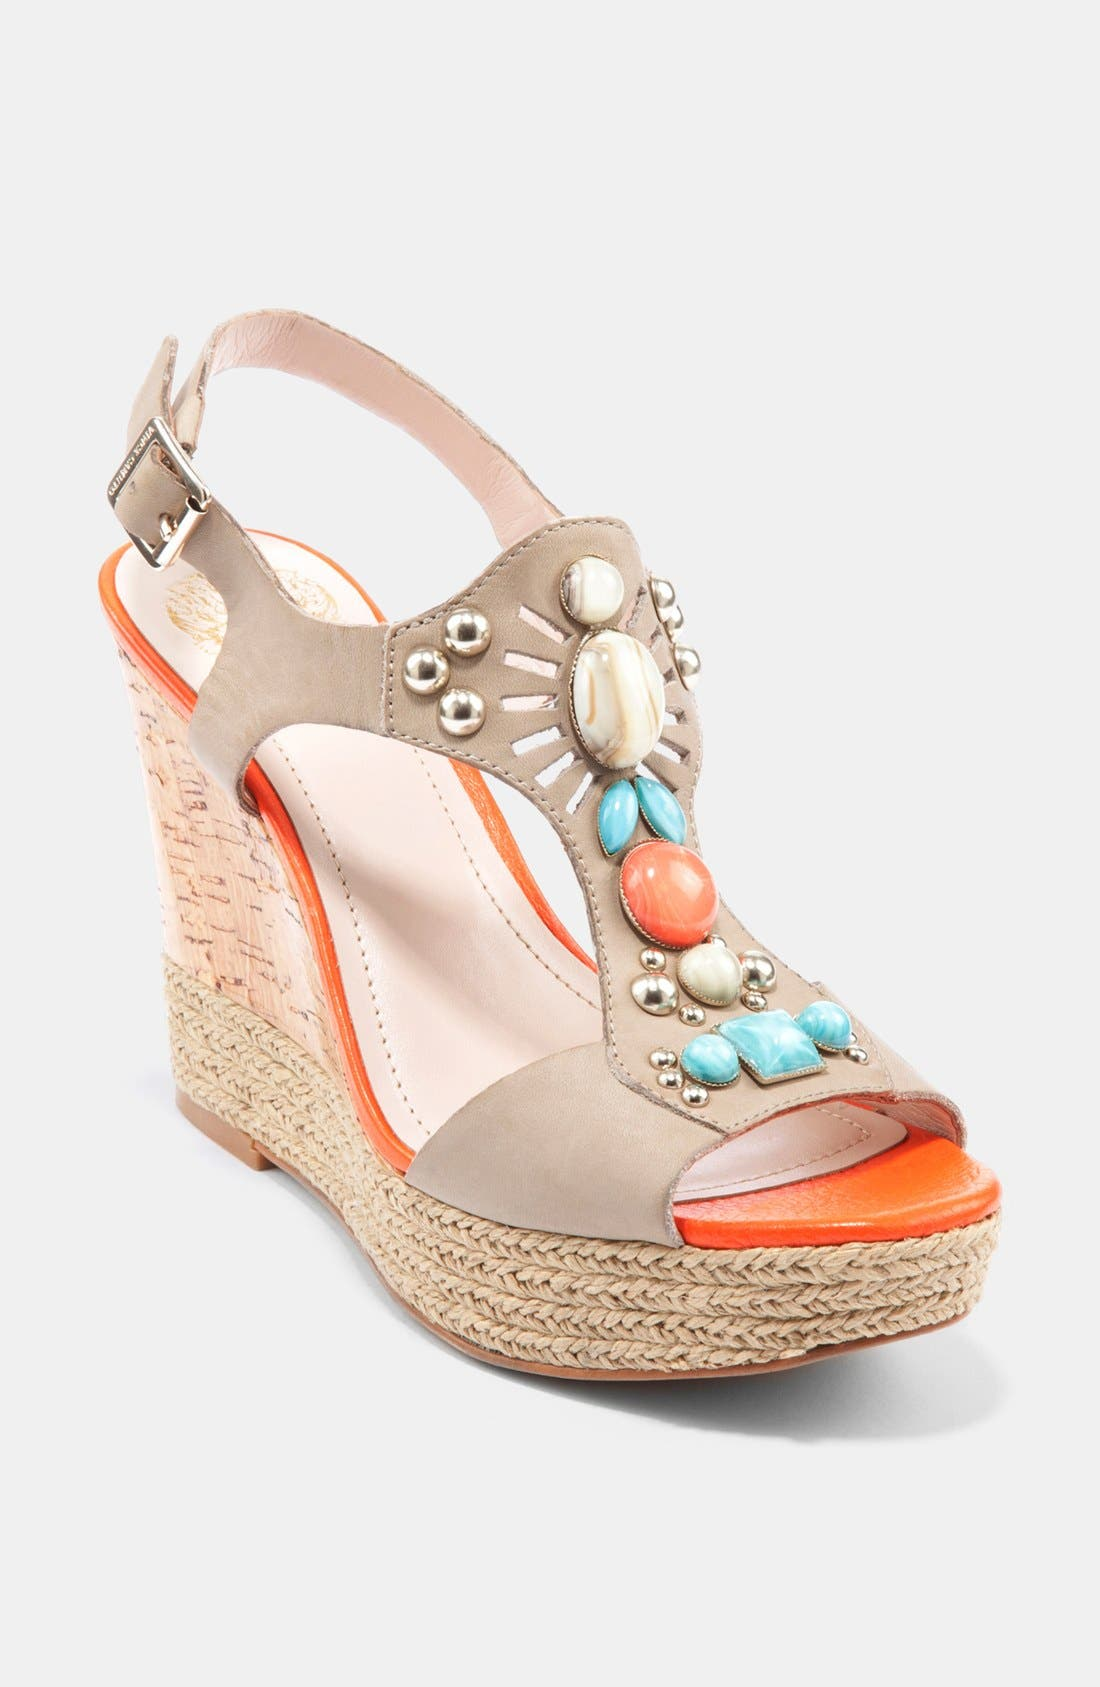 Main Image - Vince Camuto 'Tovia' Wedge Sandal